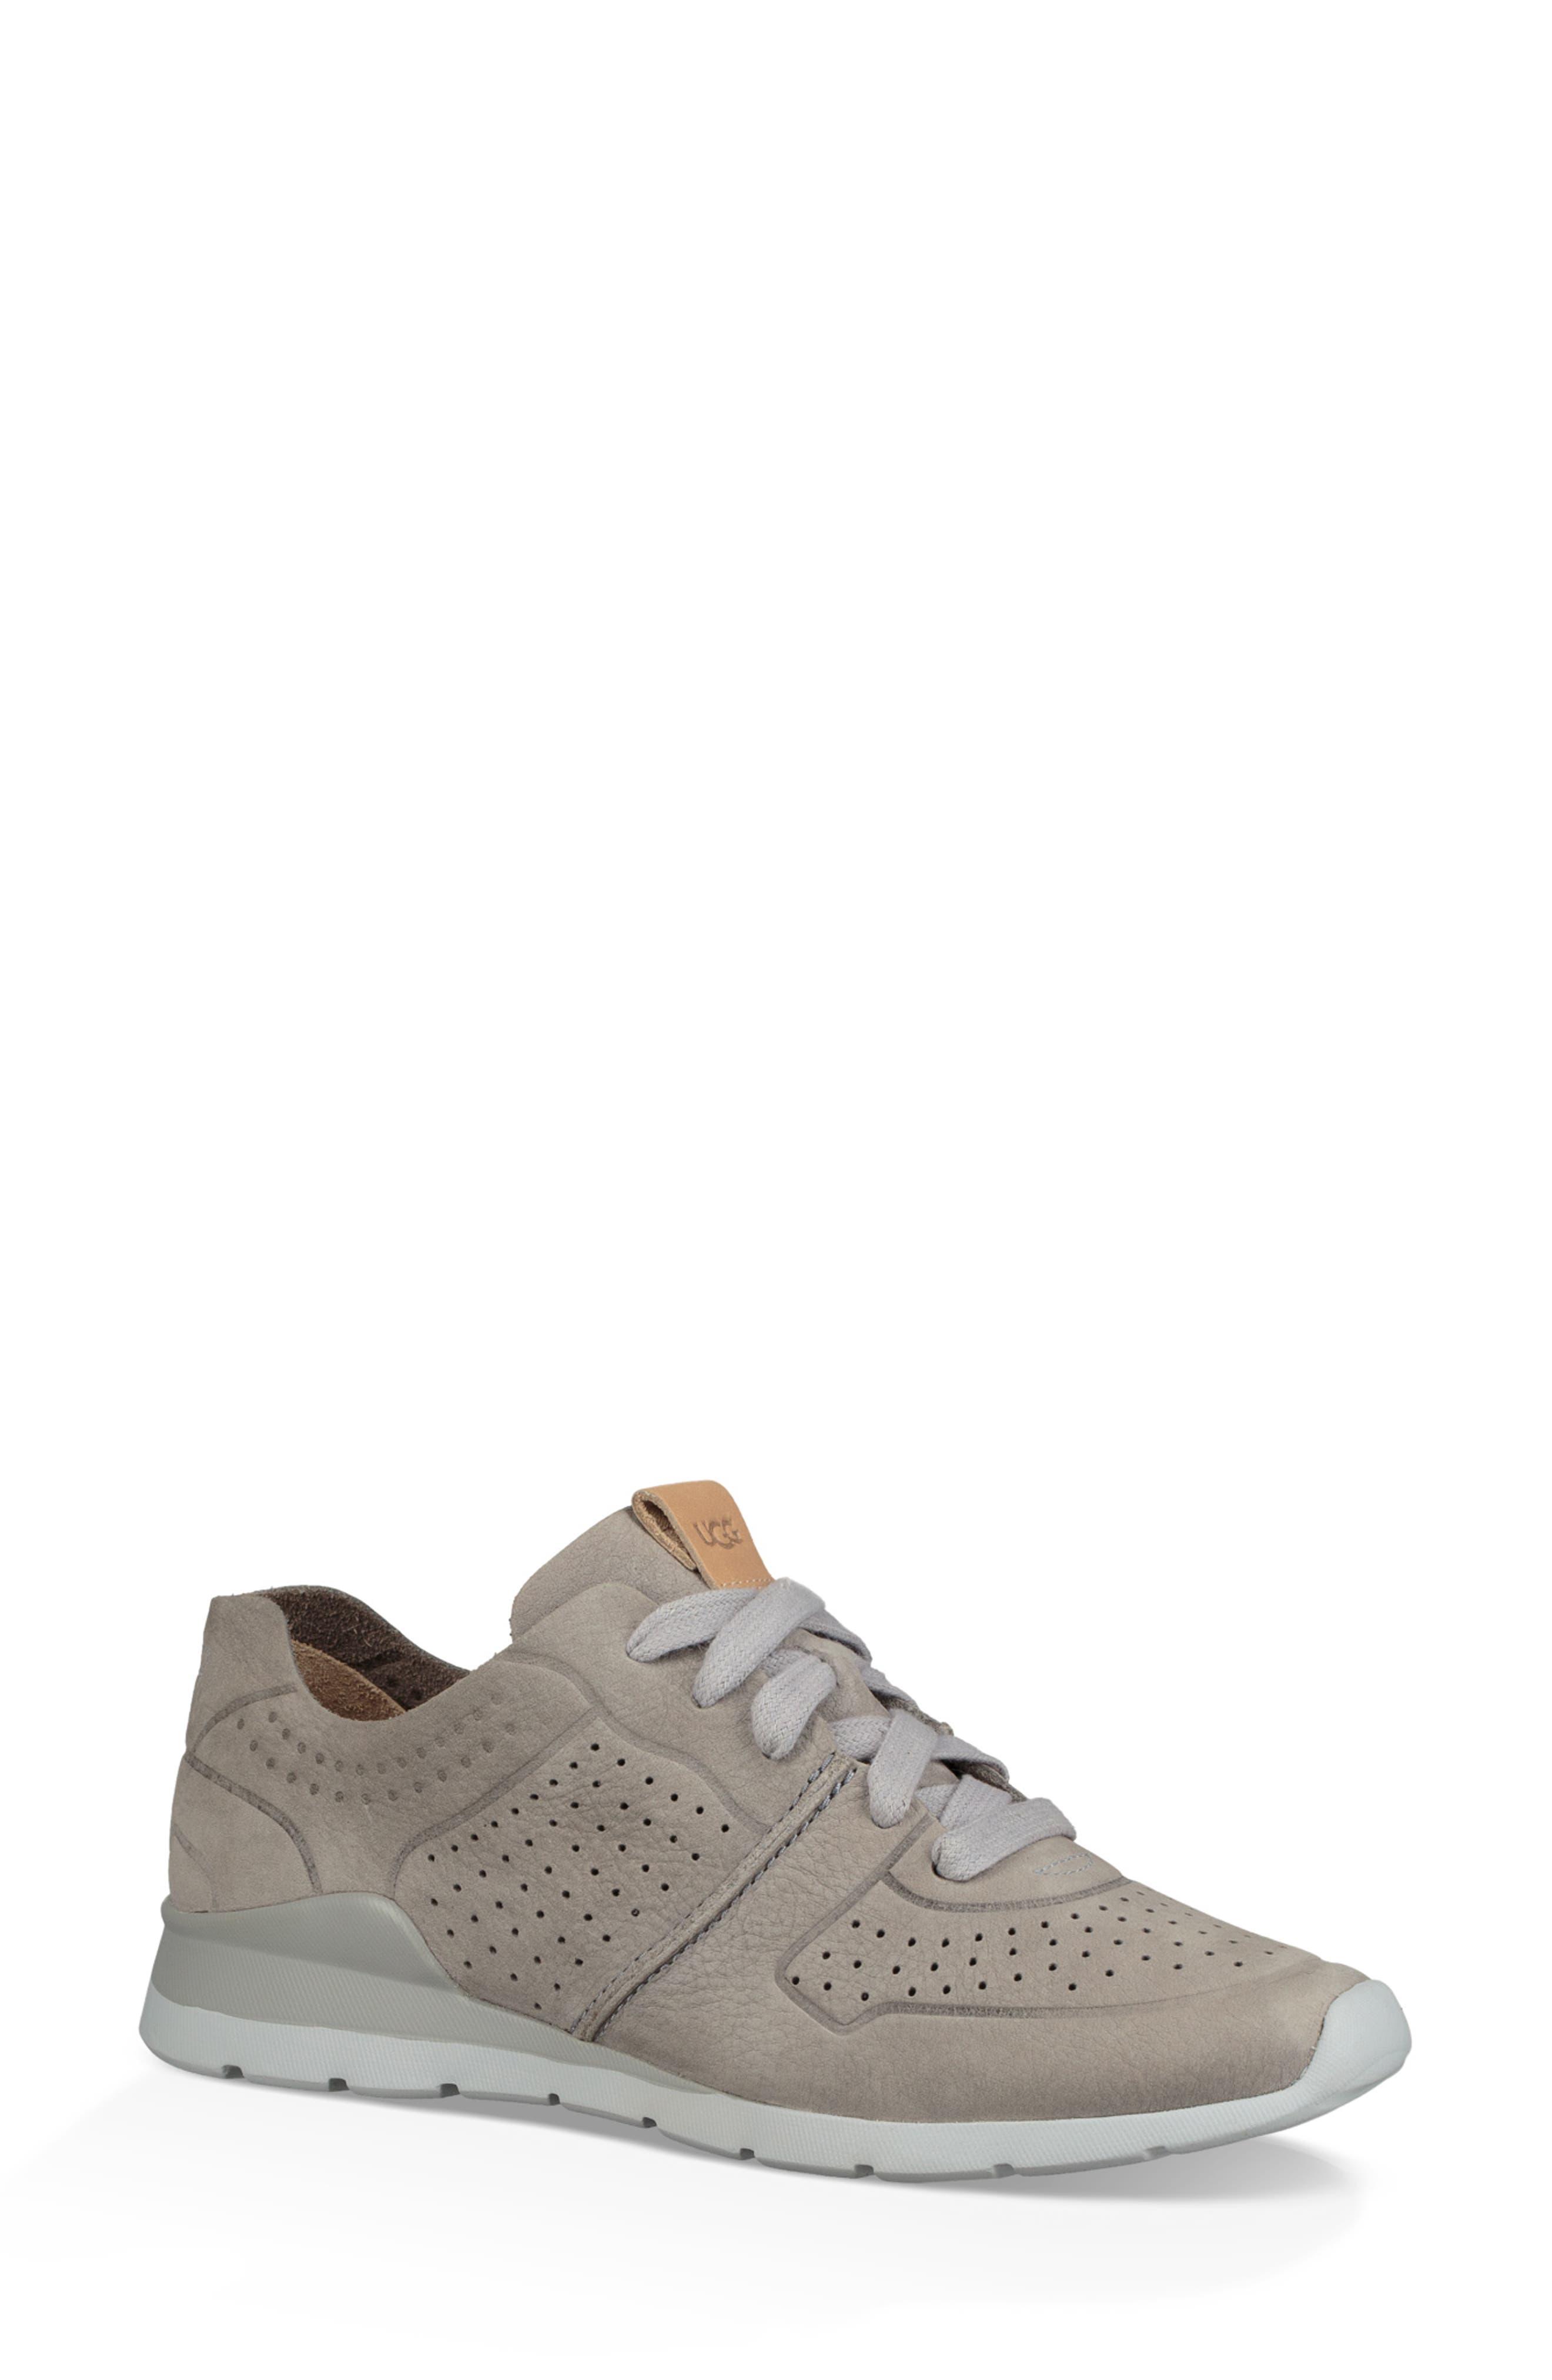 UGG<SUP>®</SUP>, Tye Sneaker, Main thumbnail 1, color, 024